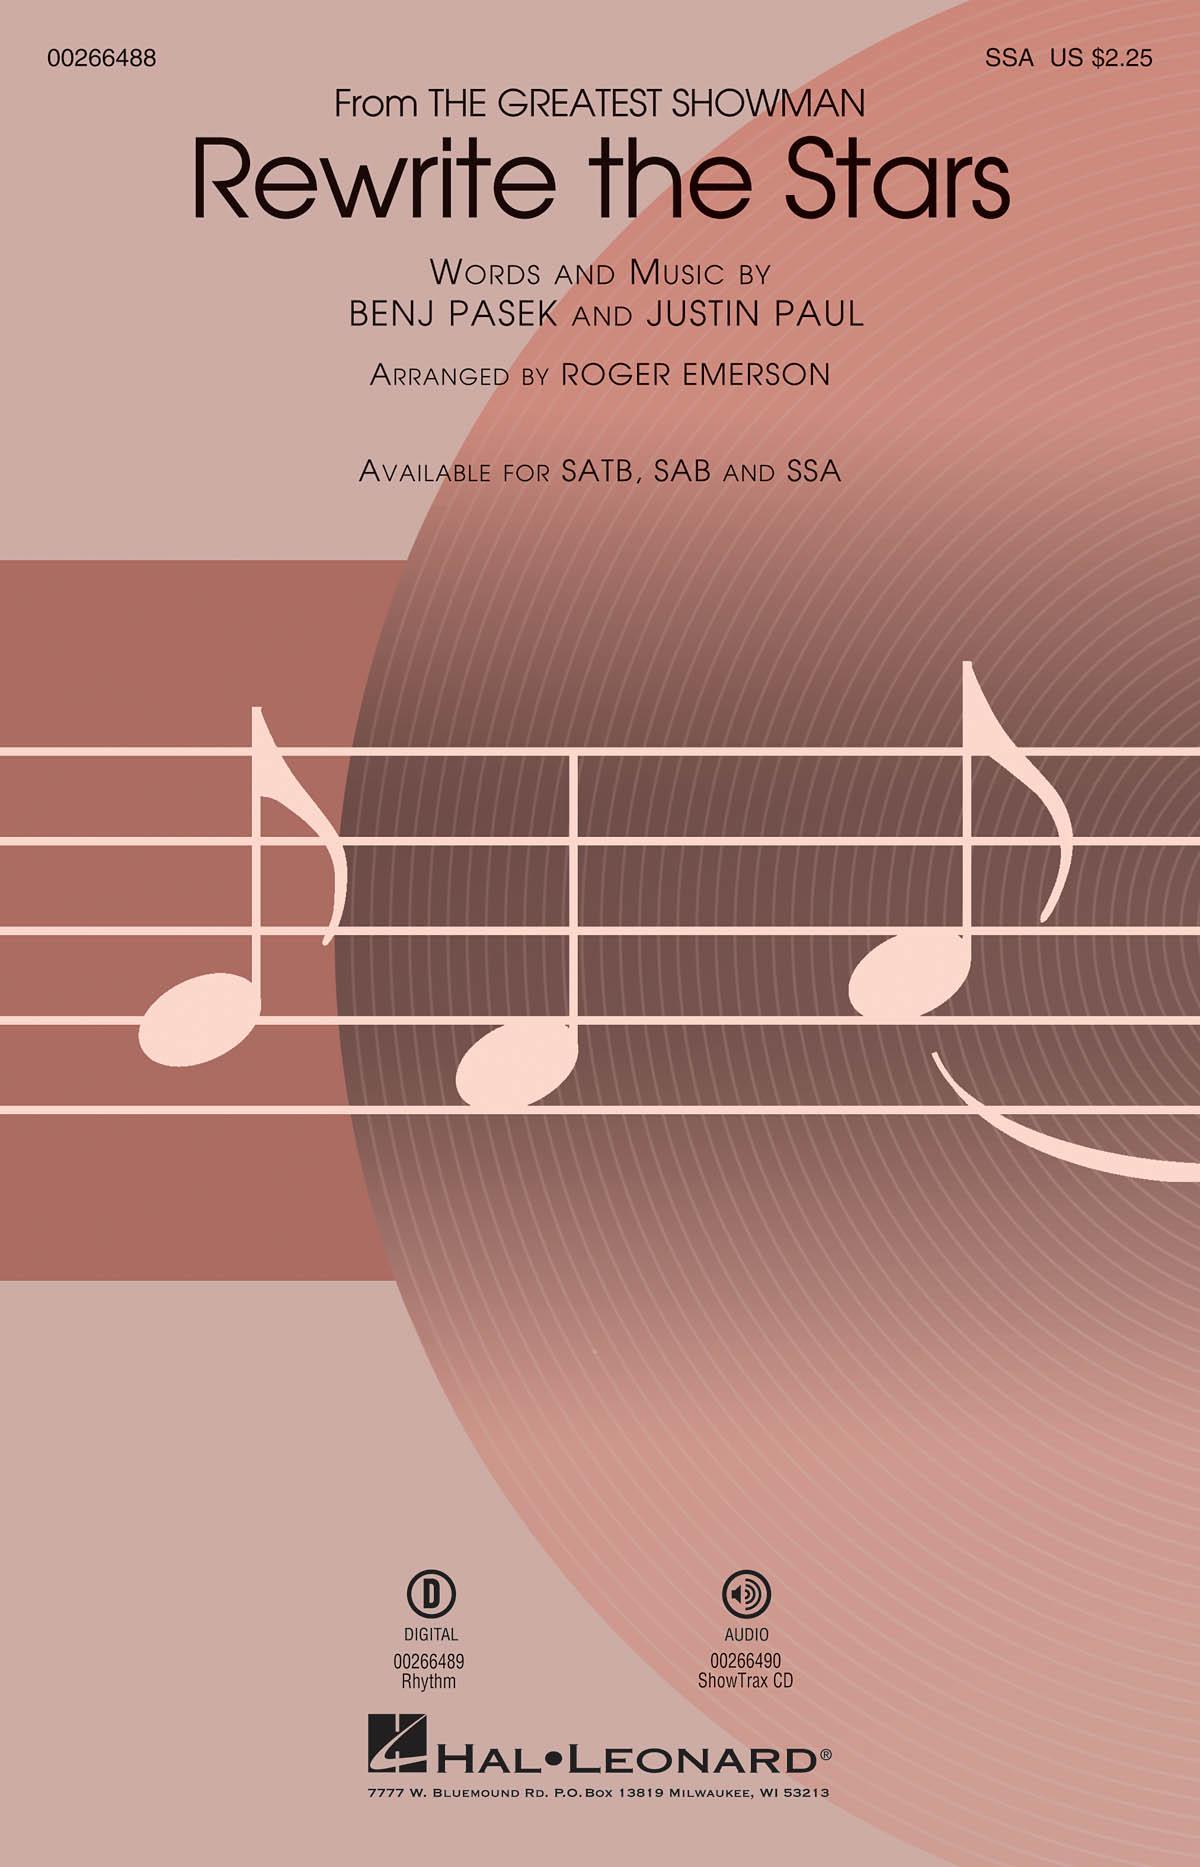 Rewrite the Stars 'The Greatest Showman' - SSA (arr. Emerson). Sheet Music  Downloads for SSA  Piano Accompaniment